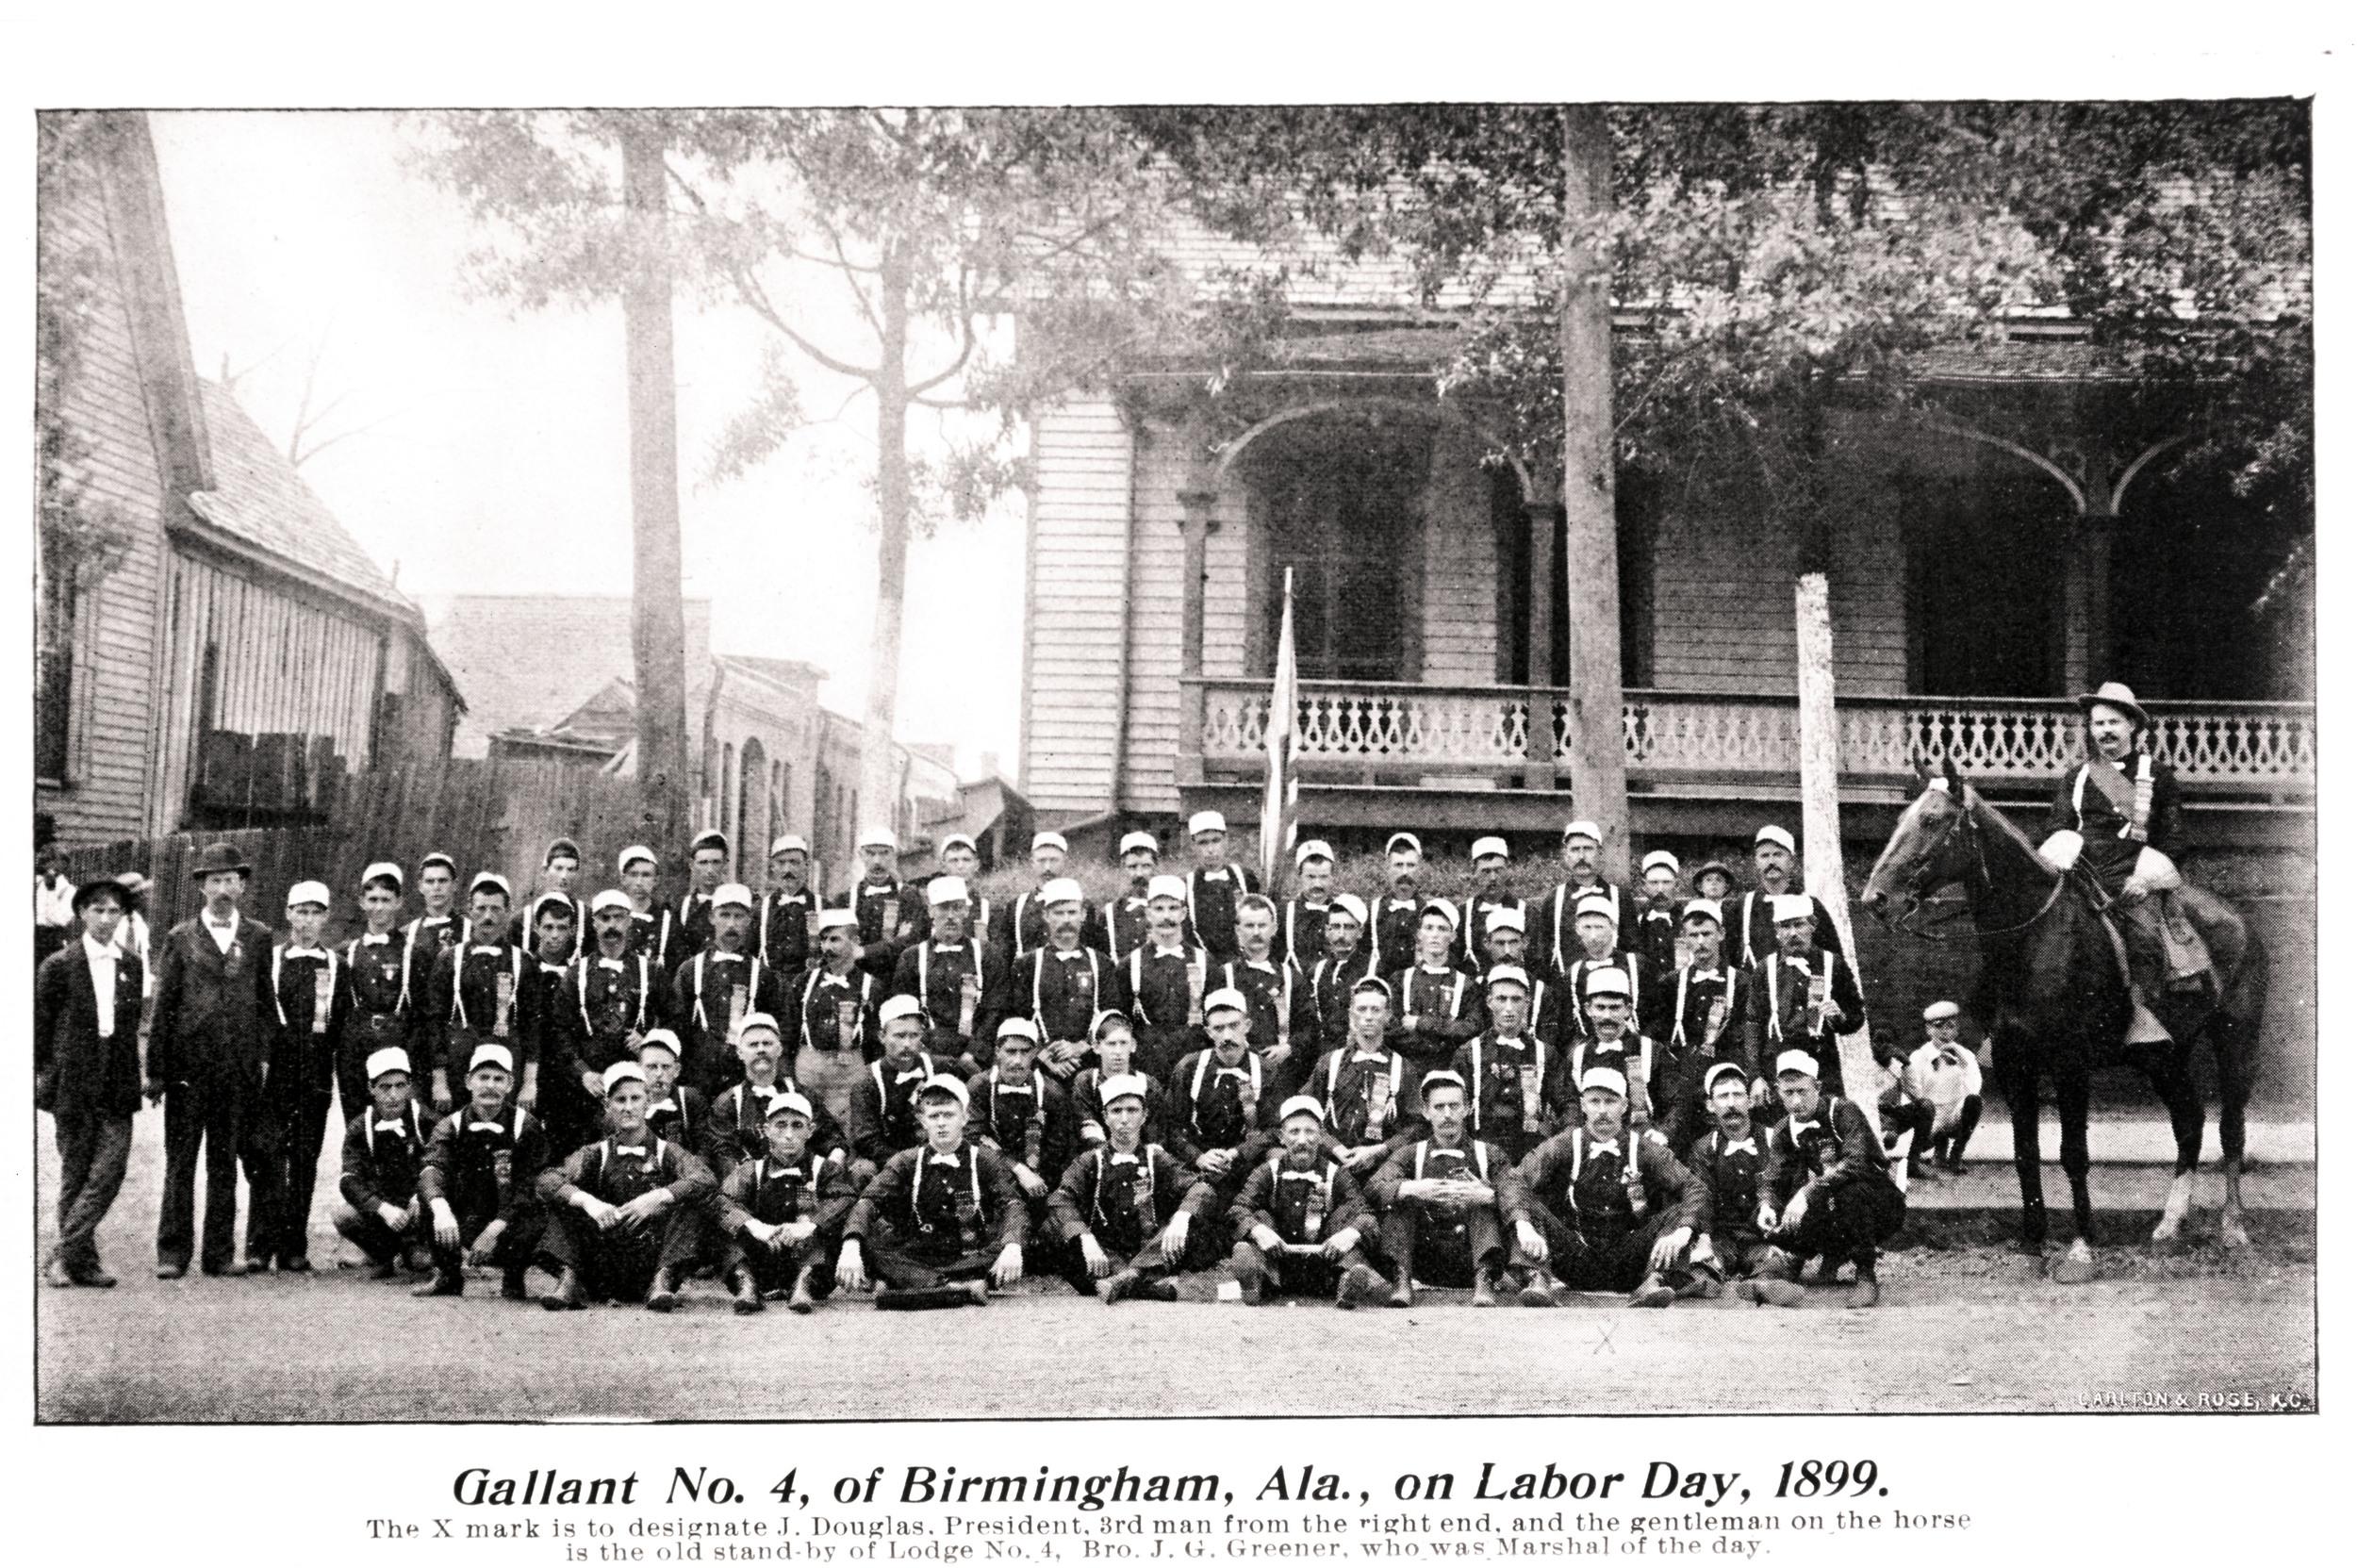 Boilermakers Lodge 4 (Birmingham, Ala.) on Labor Day, 1899